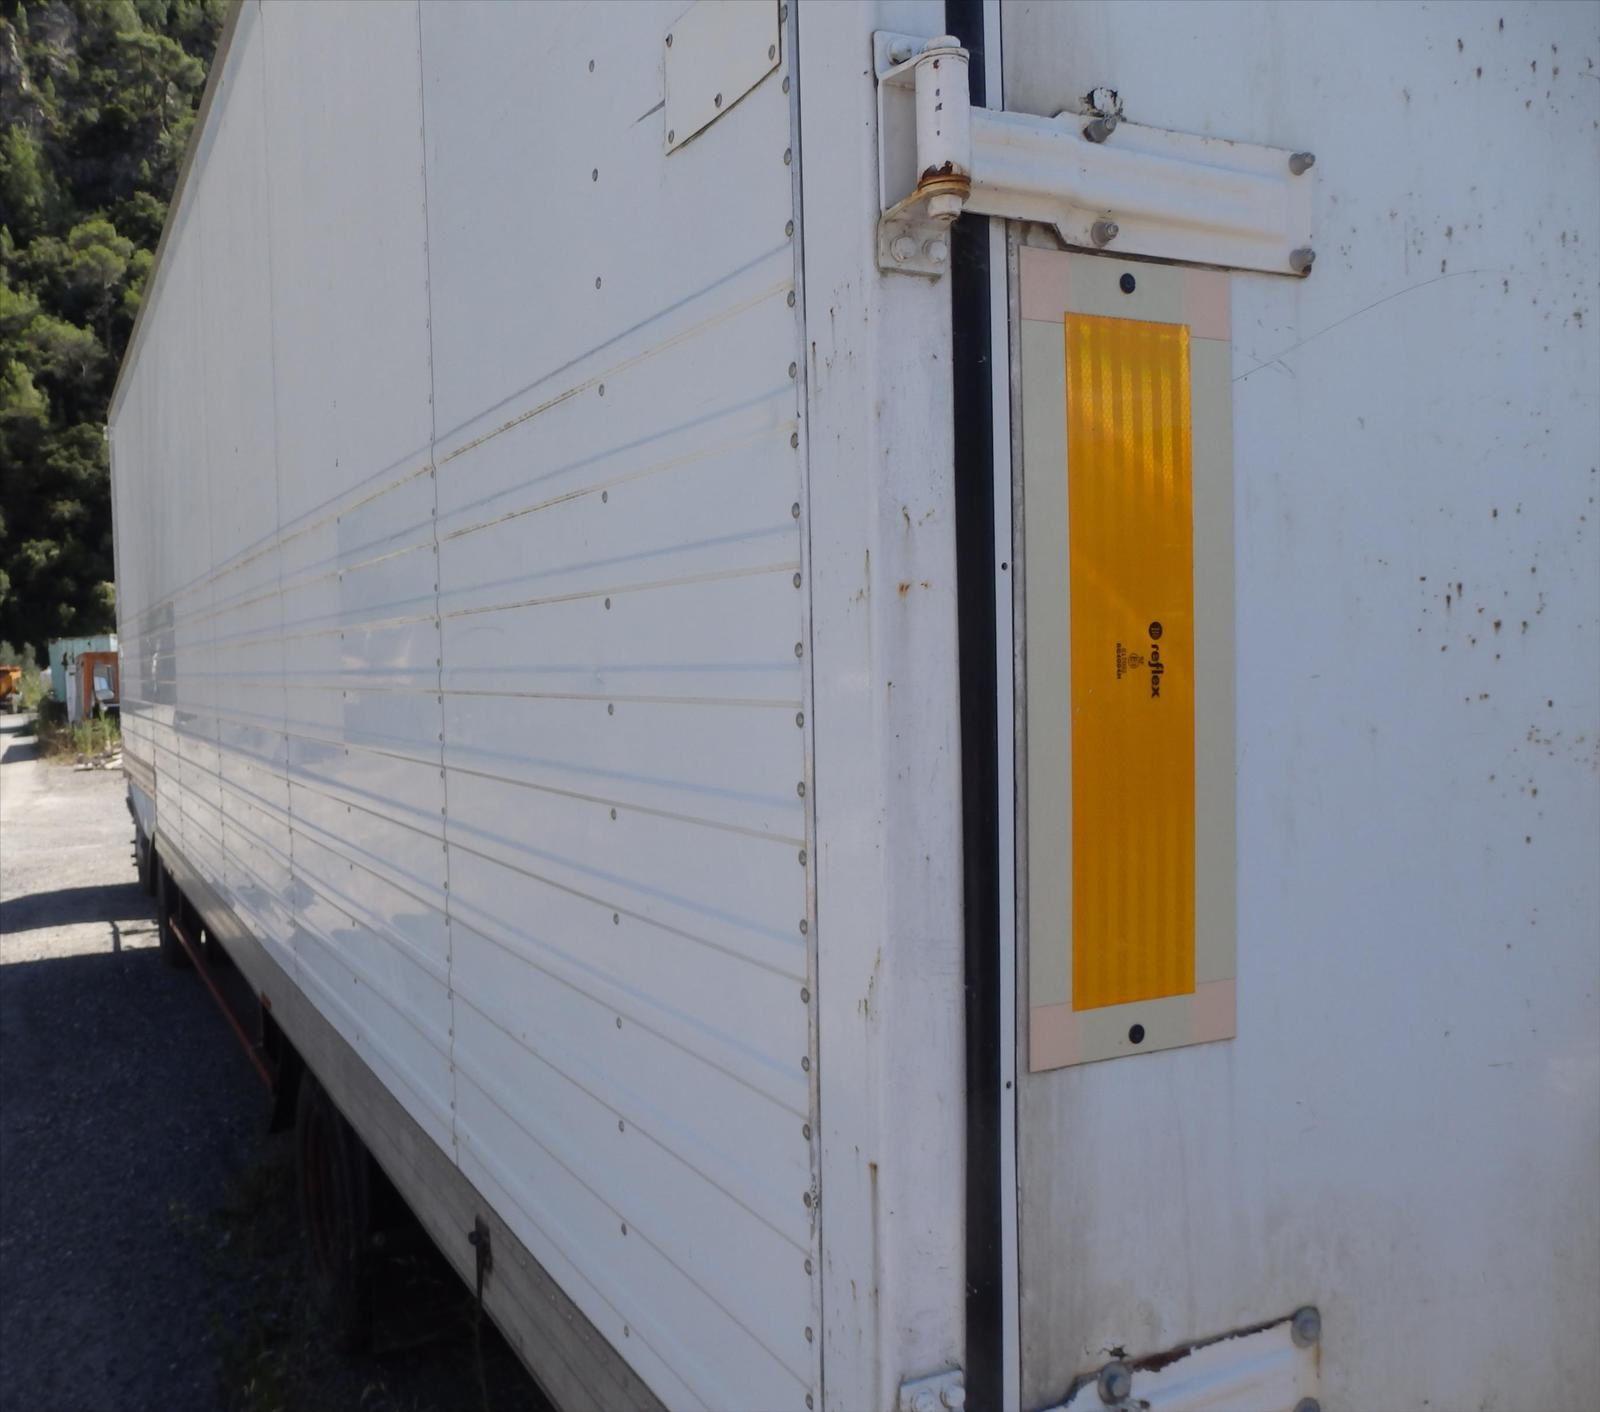 Camion Tracteur Renault B90 RVI SREM Semi Remorque Trouillet Fourgon Alu Tel: 0608066192 TRANSCOMM13 Pierre BASSAT